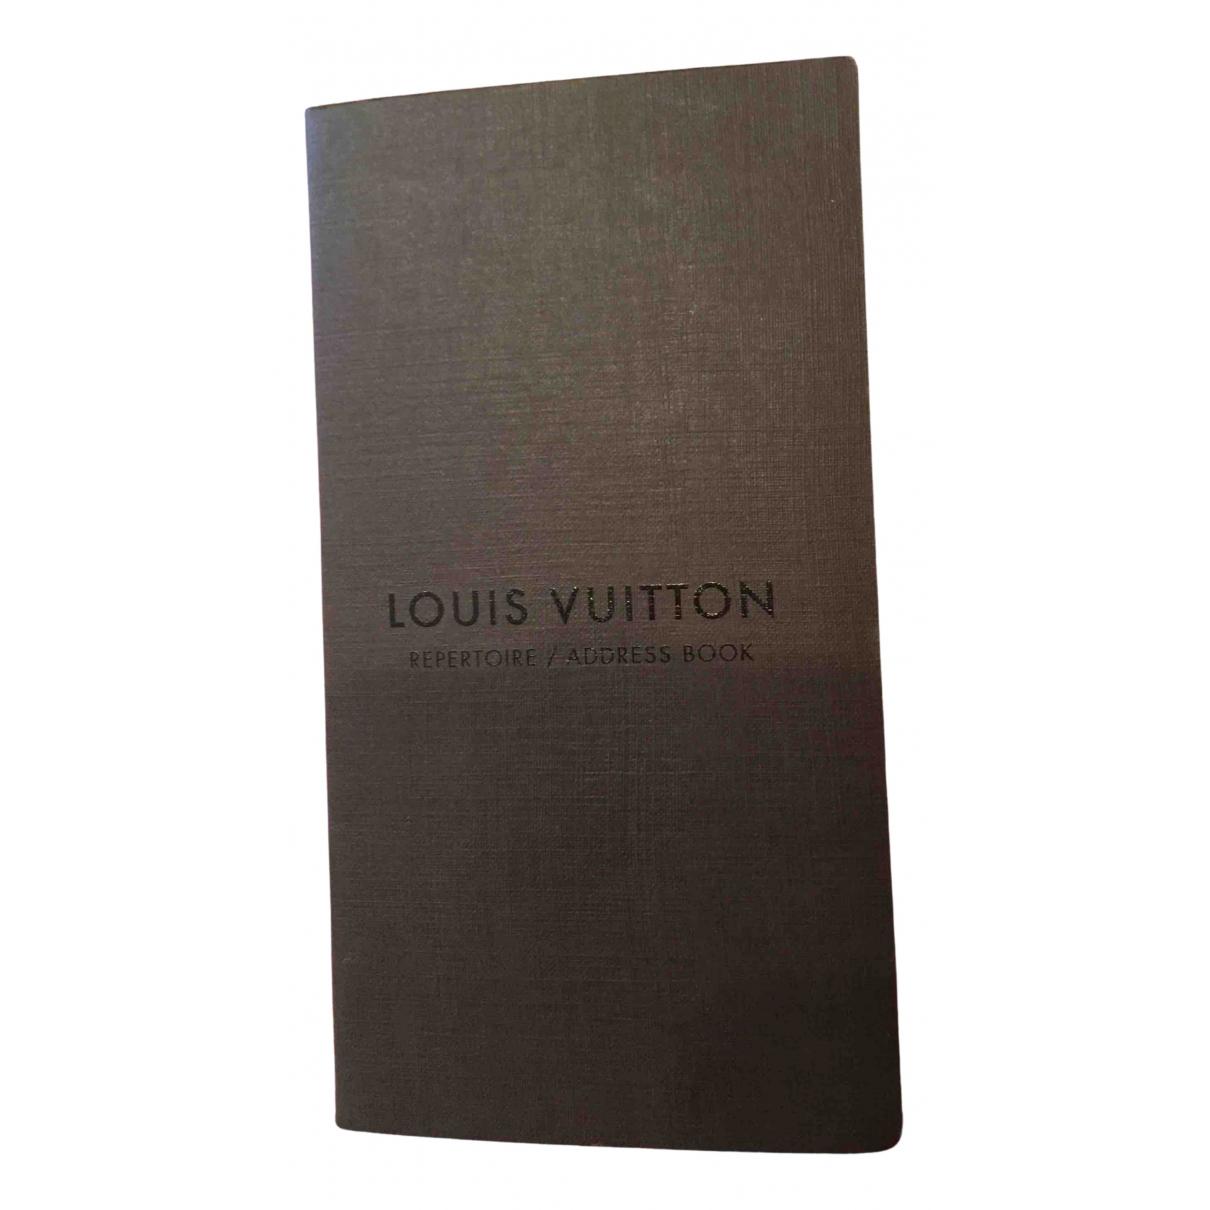 Louis Vuitton N Brown Home decor for Life & Living N